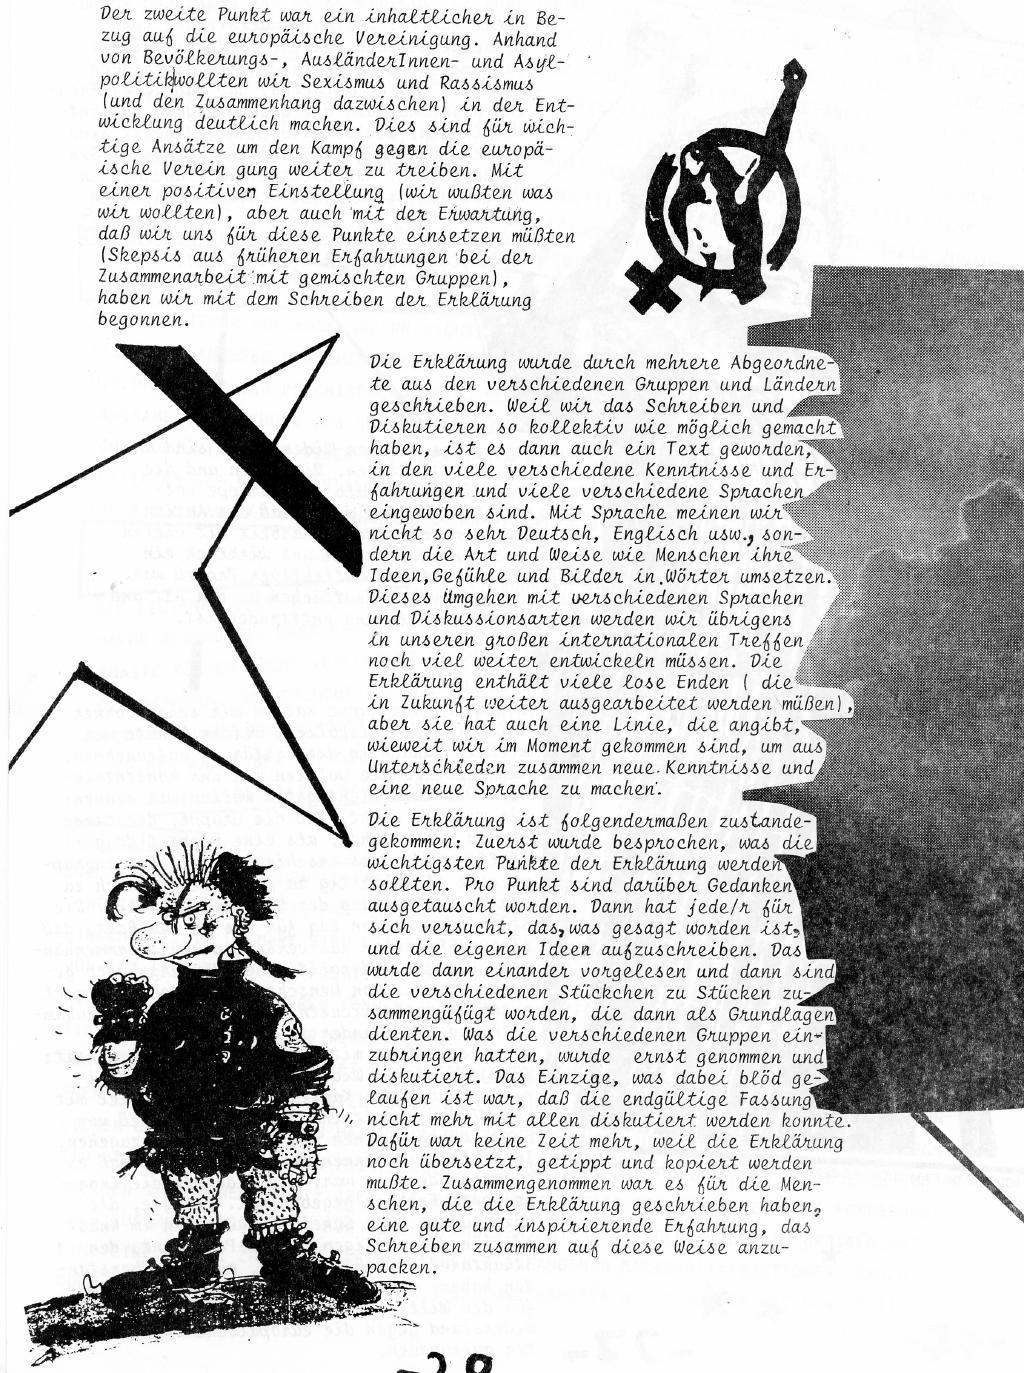 Belgien_Doku_Besetzung_EG_Kommission_1989_030